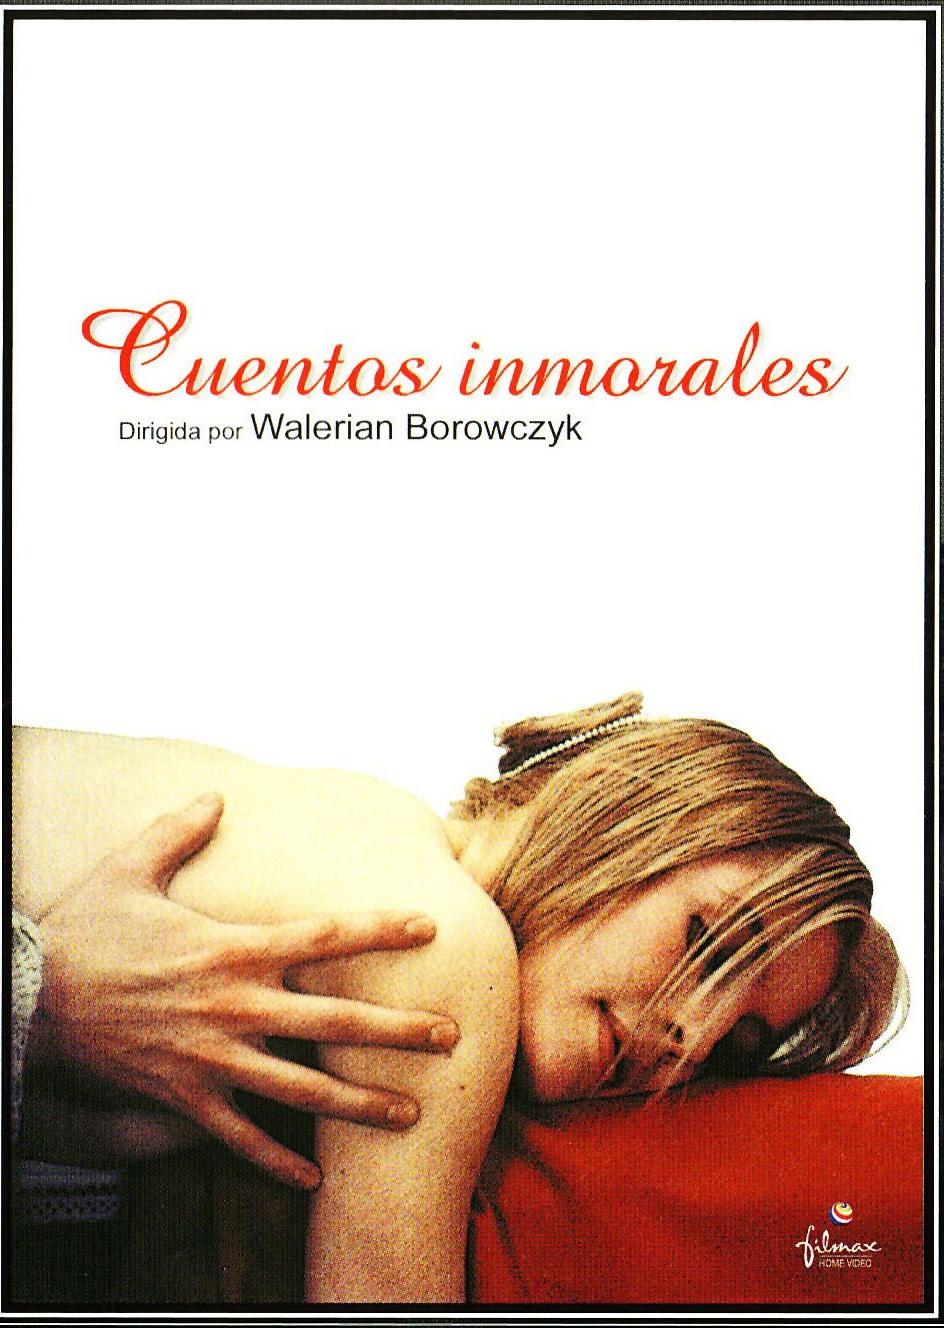 vetrina rossa venezia massaggi gay porno